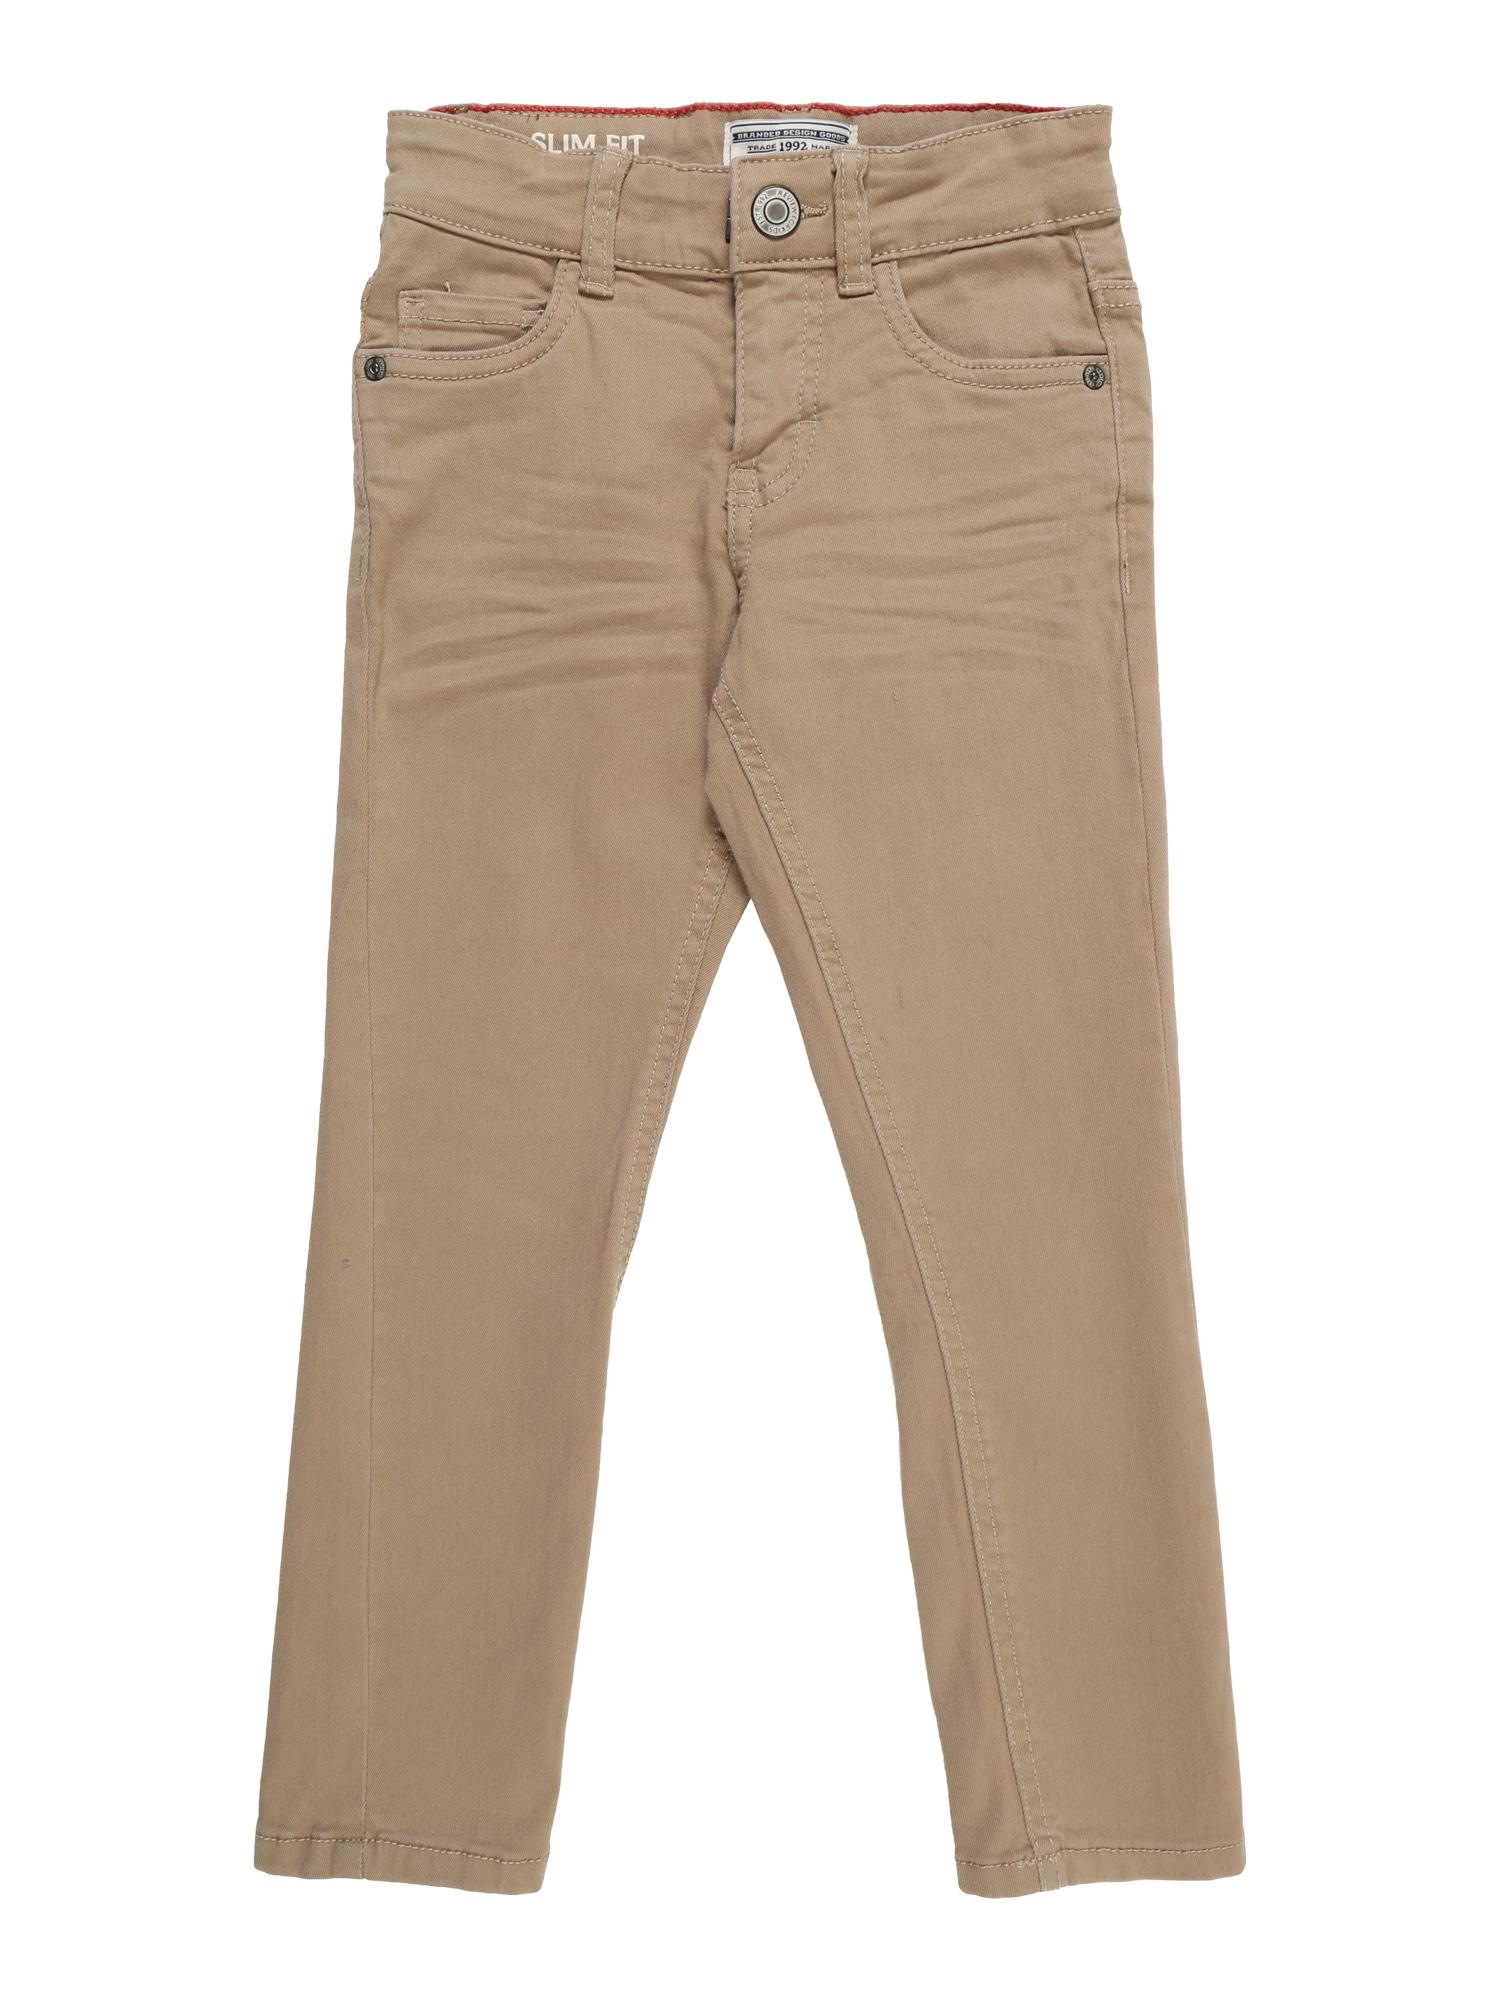 Kalhoty KB-19-P201SLSK velbloudí REVIEW FOR KIDS